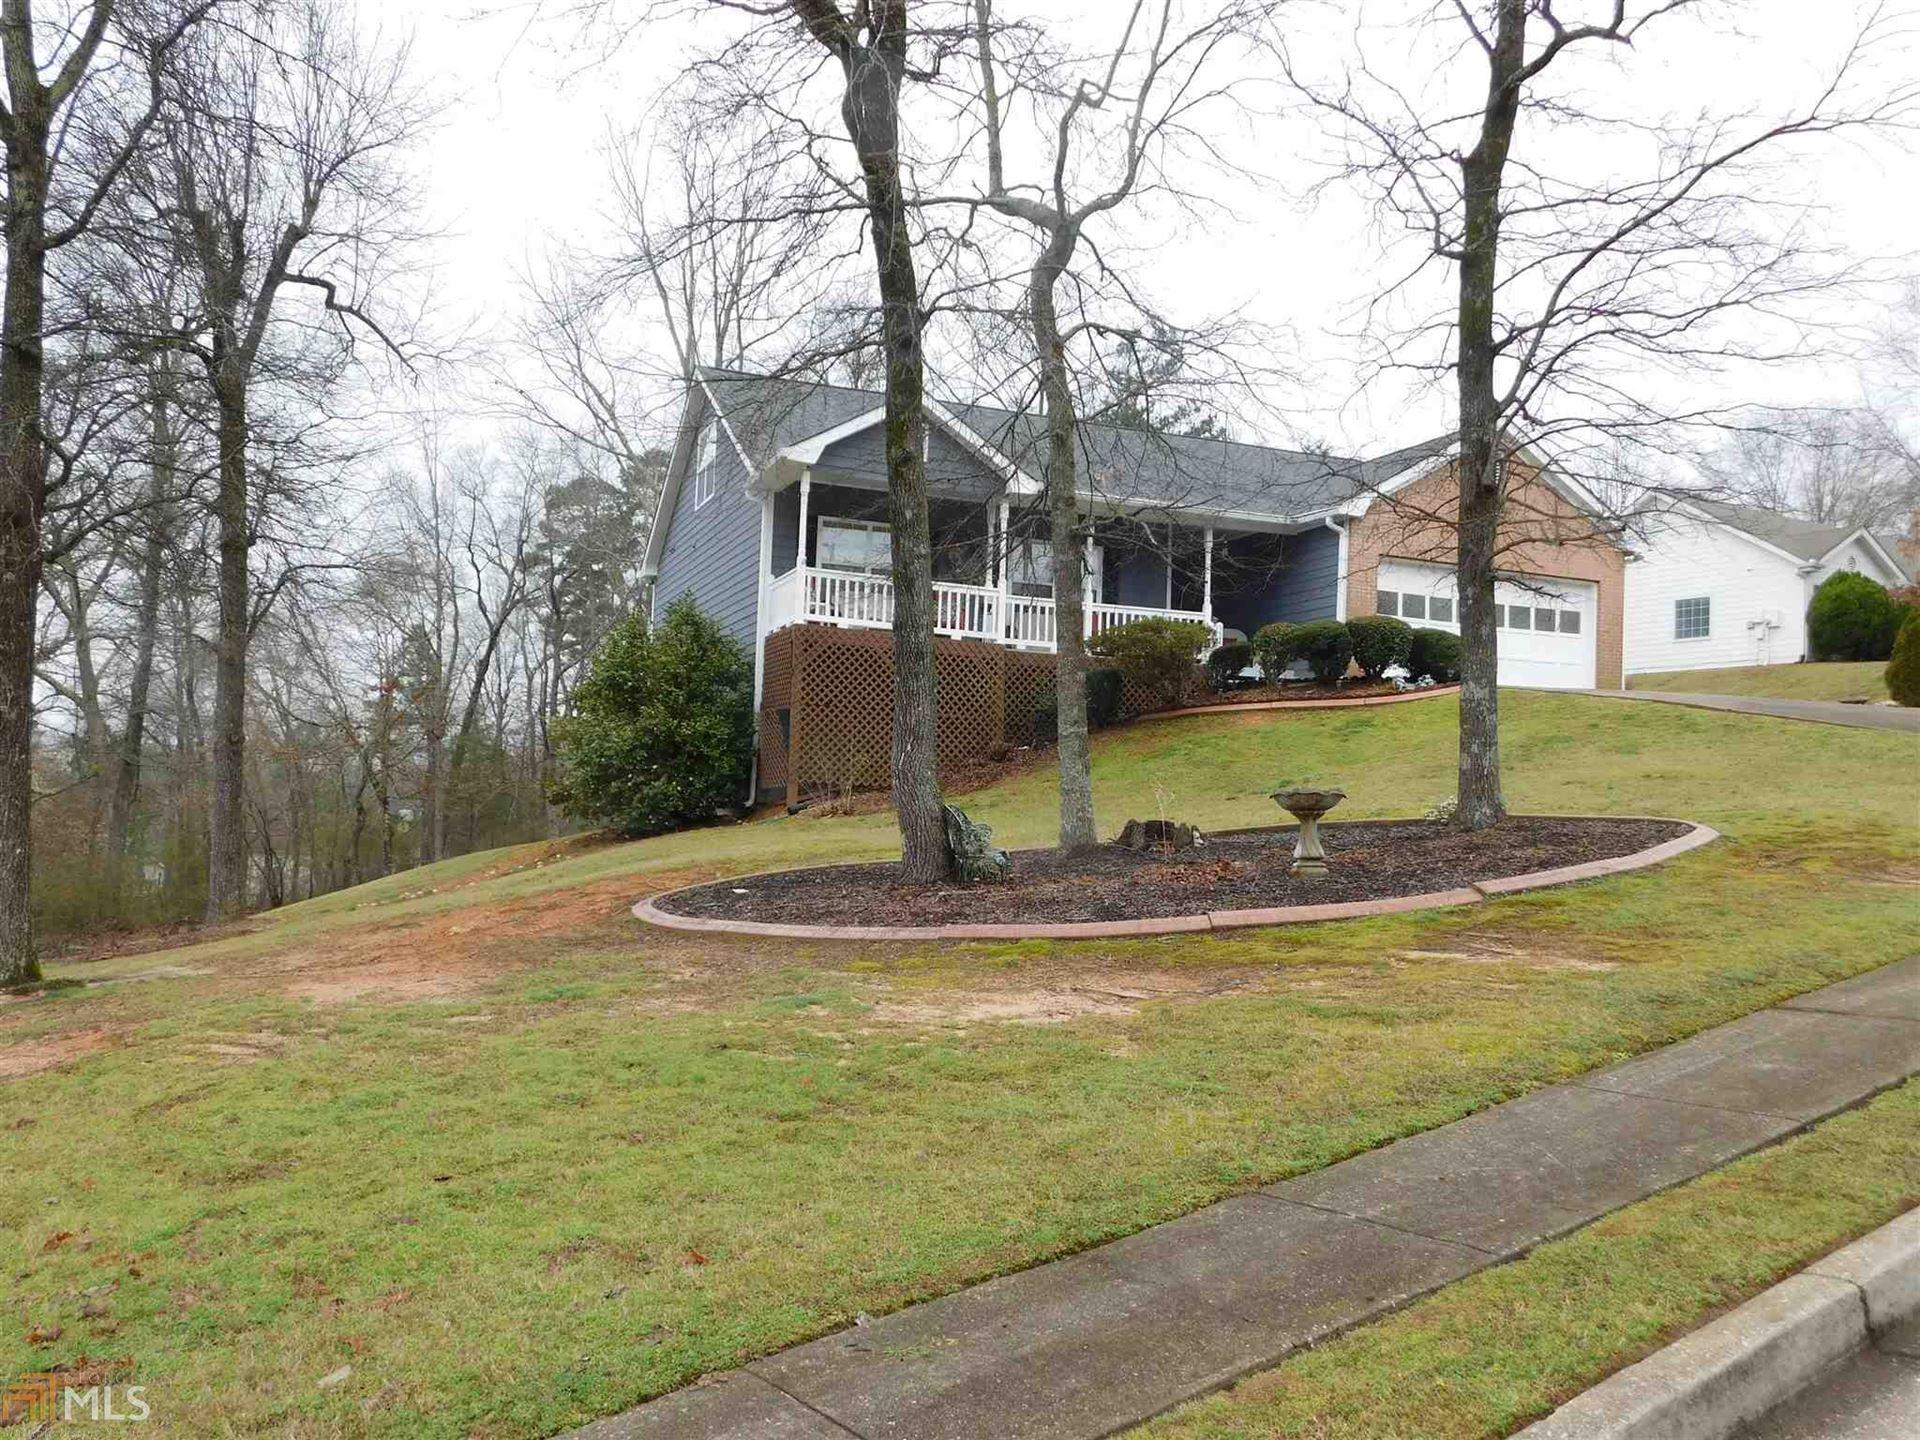 3245 Spincaster Way, Loganville, GA 30052 - MLS#: 8754490